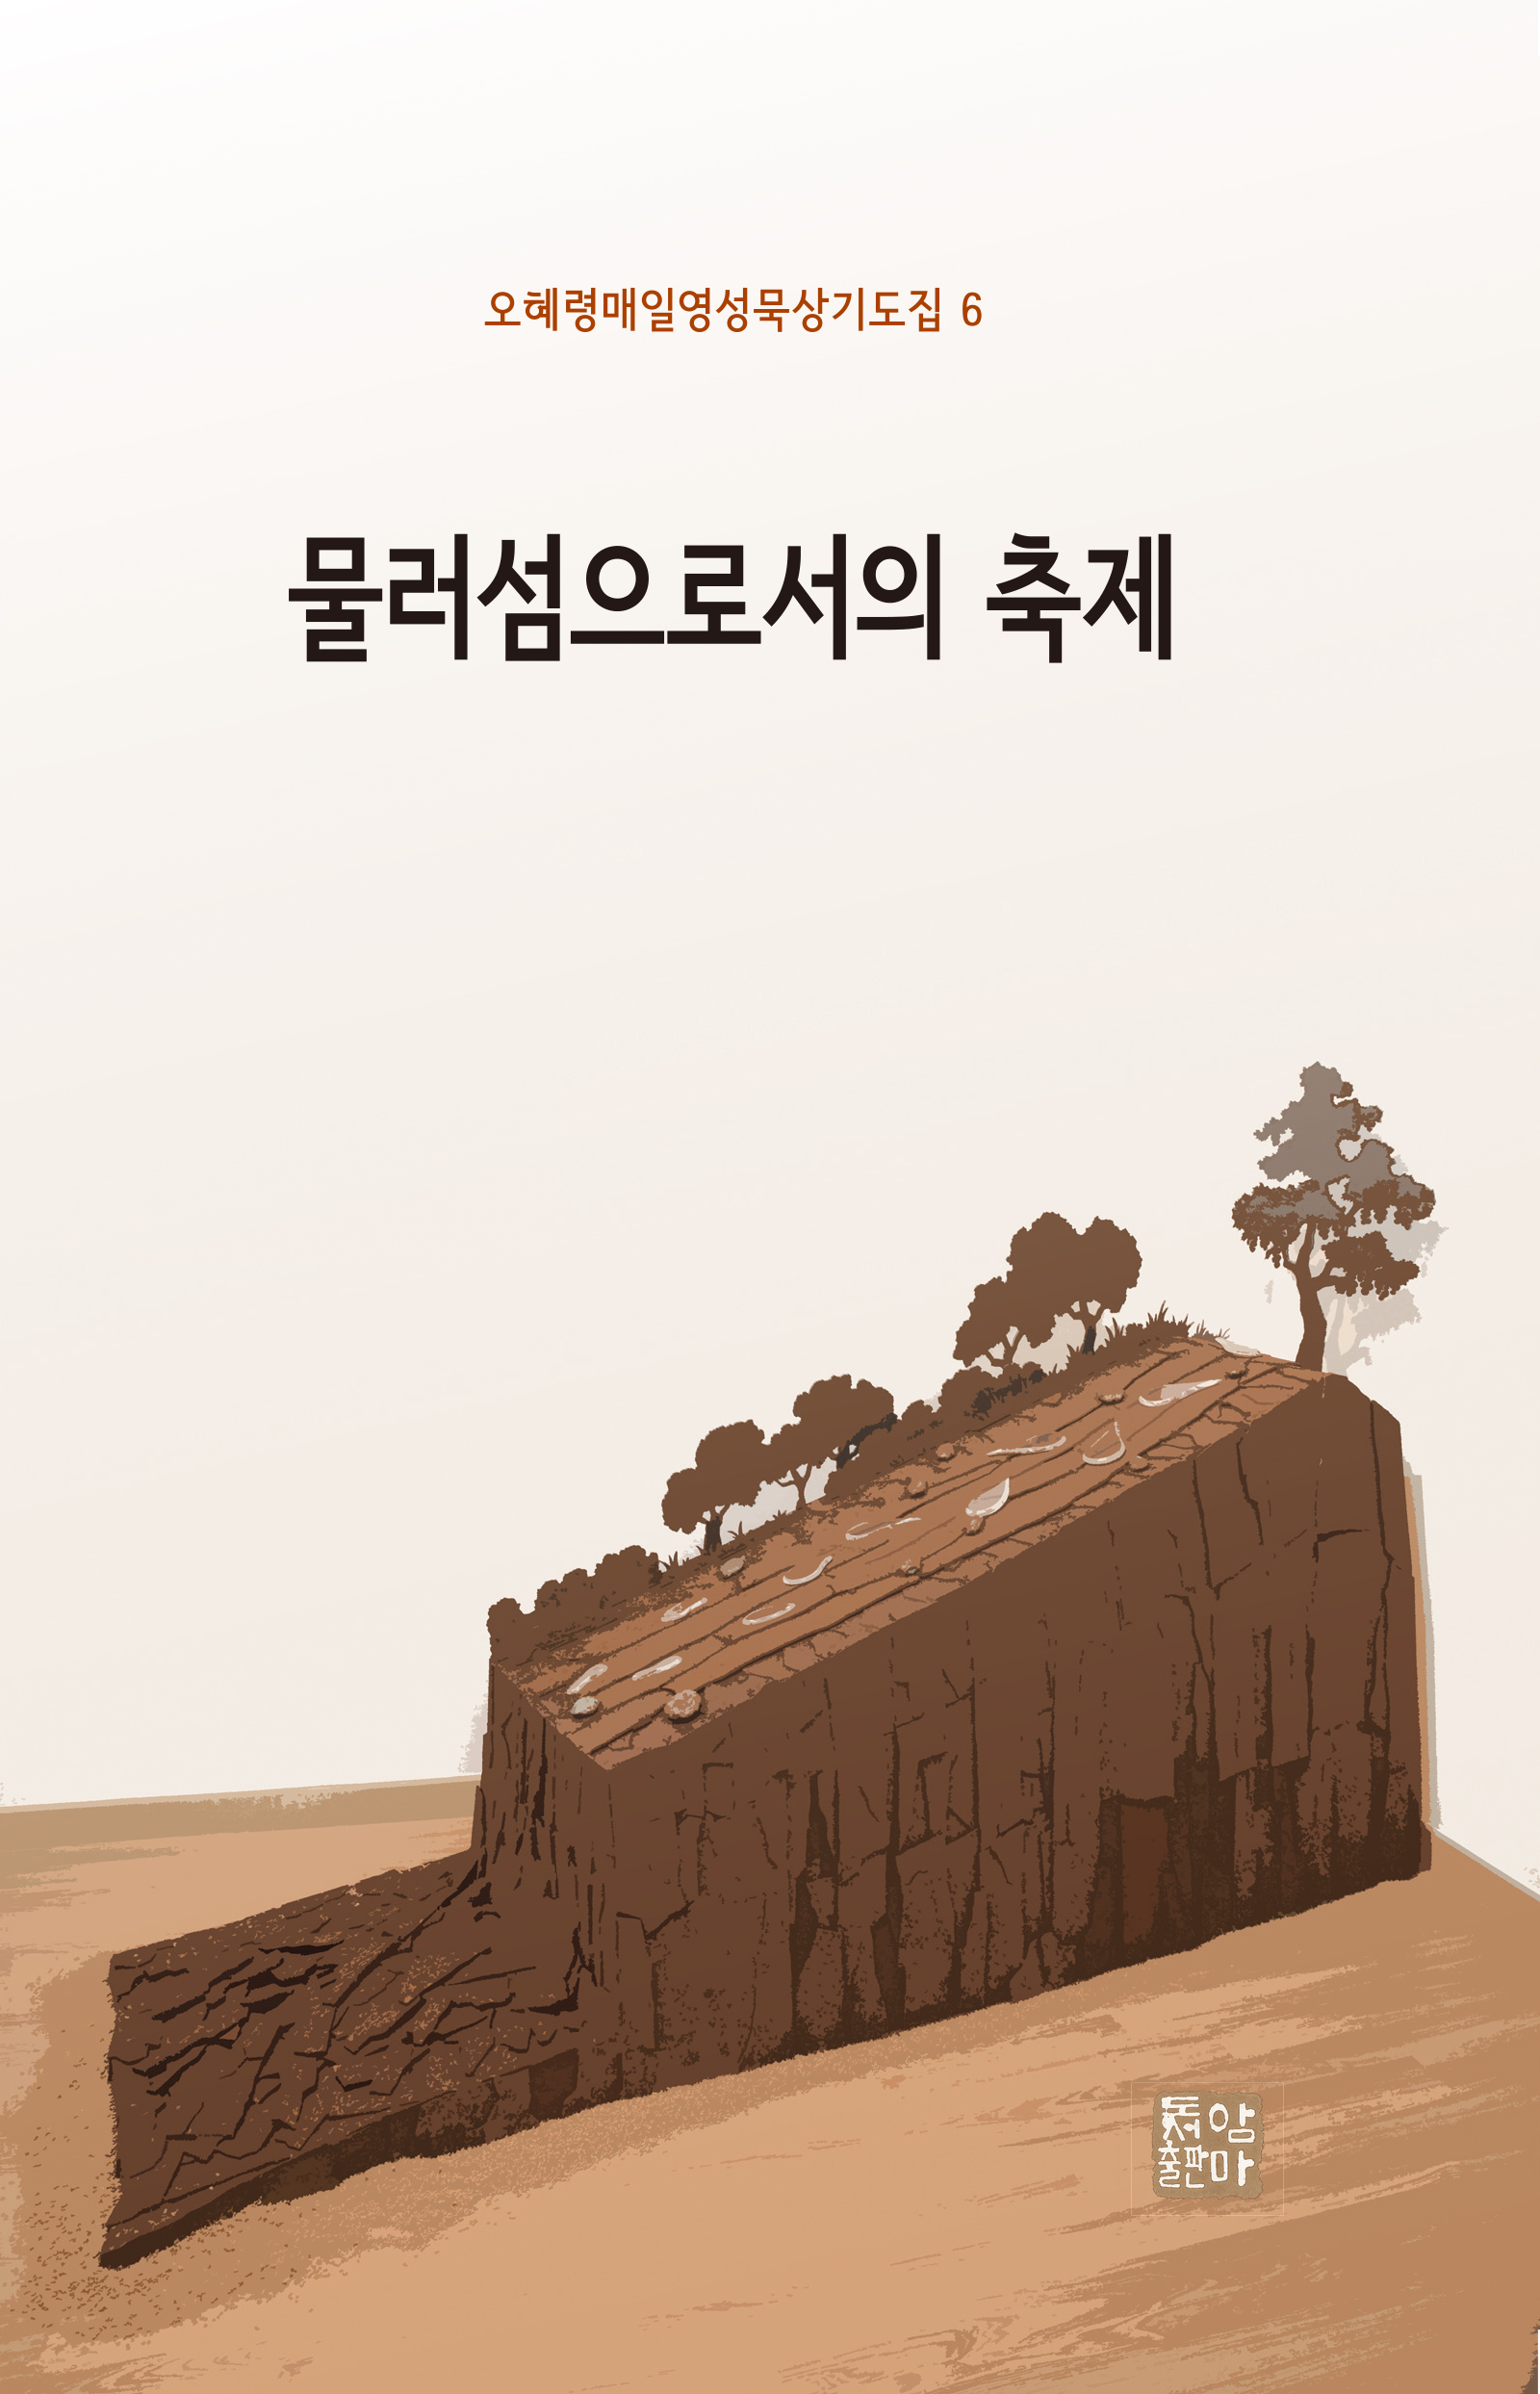 book64+물러섬으로서의+축제.jpg